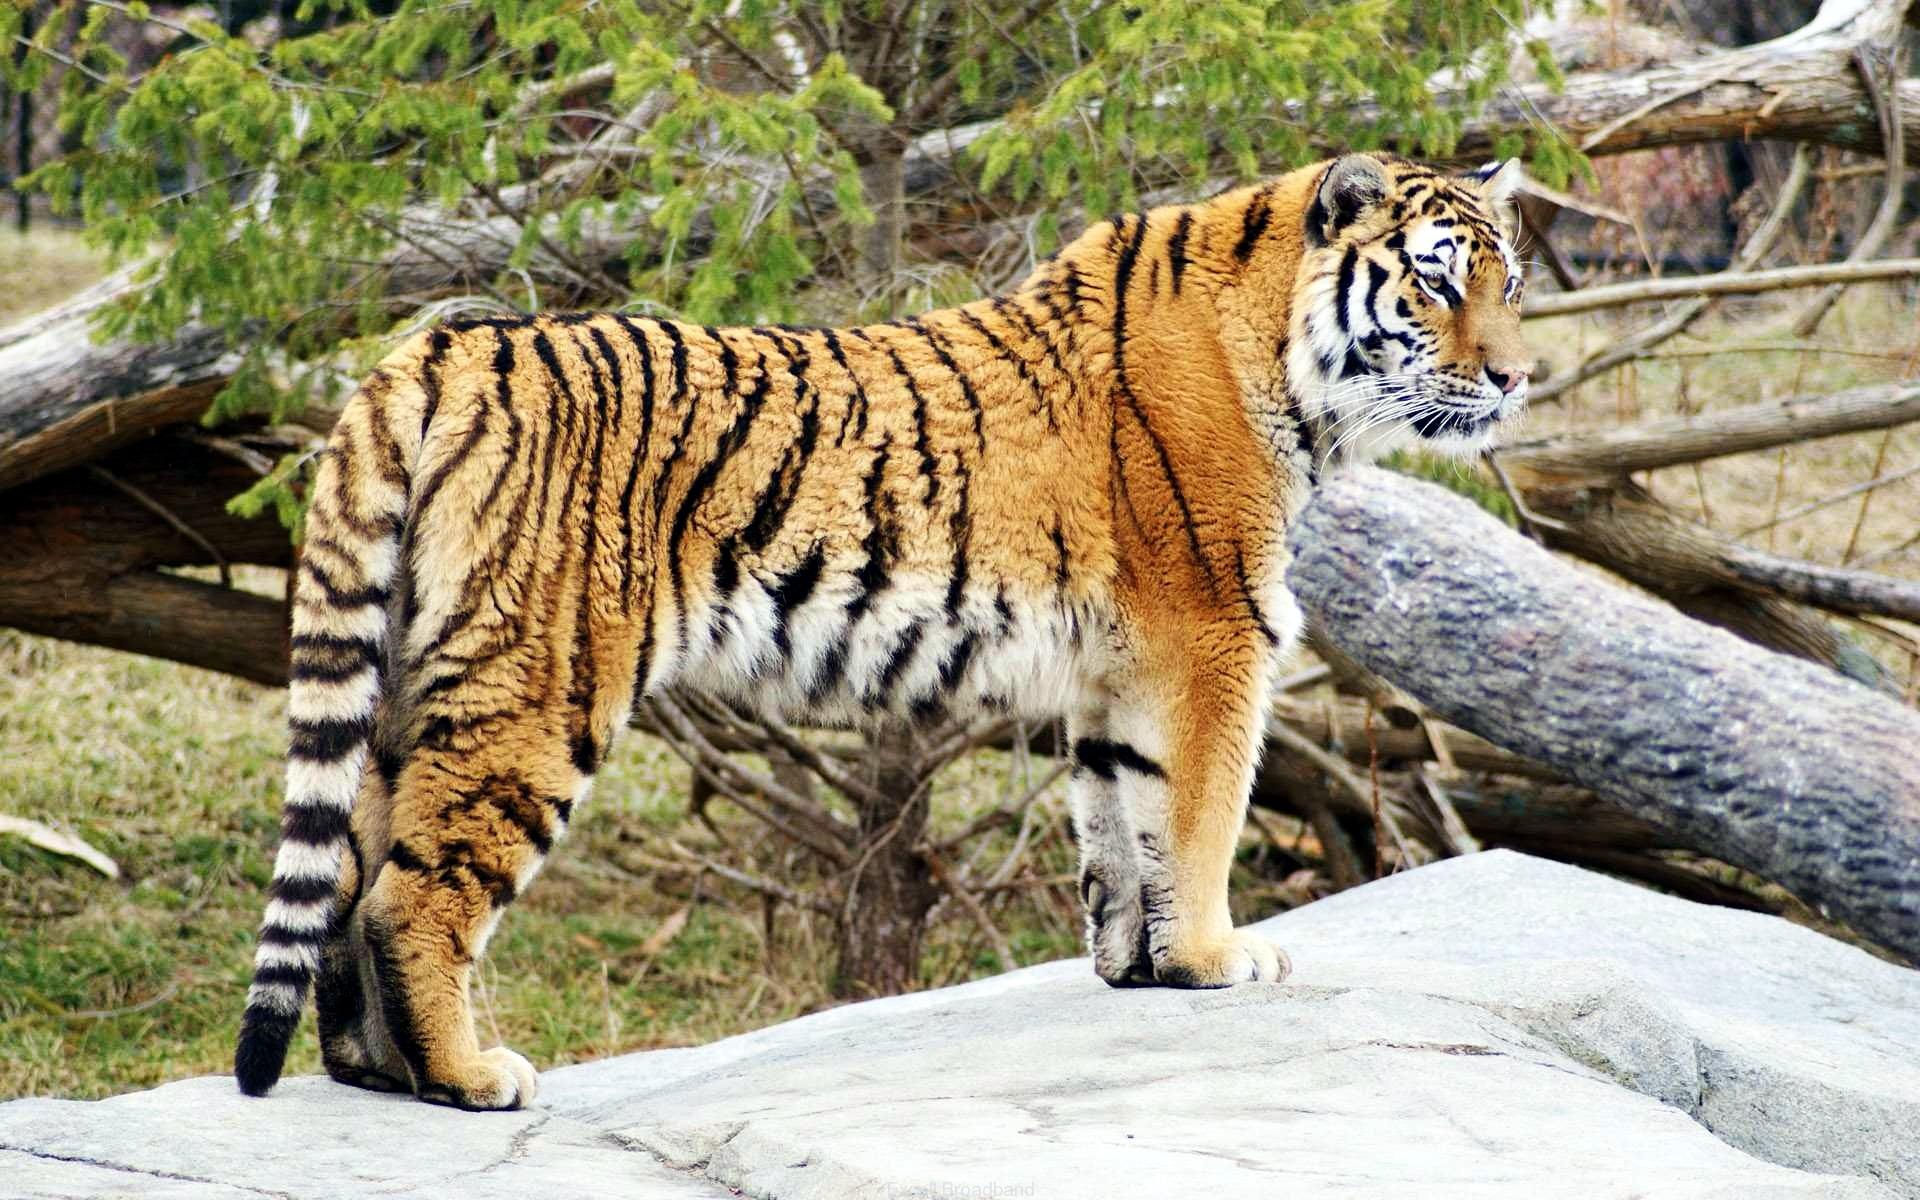 wallpaper tiger widescreen hd gray, tiger, widescreen